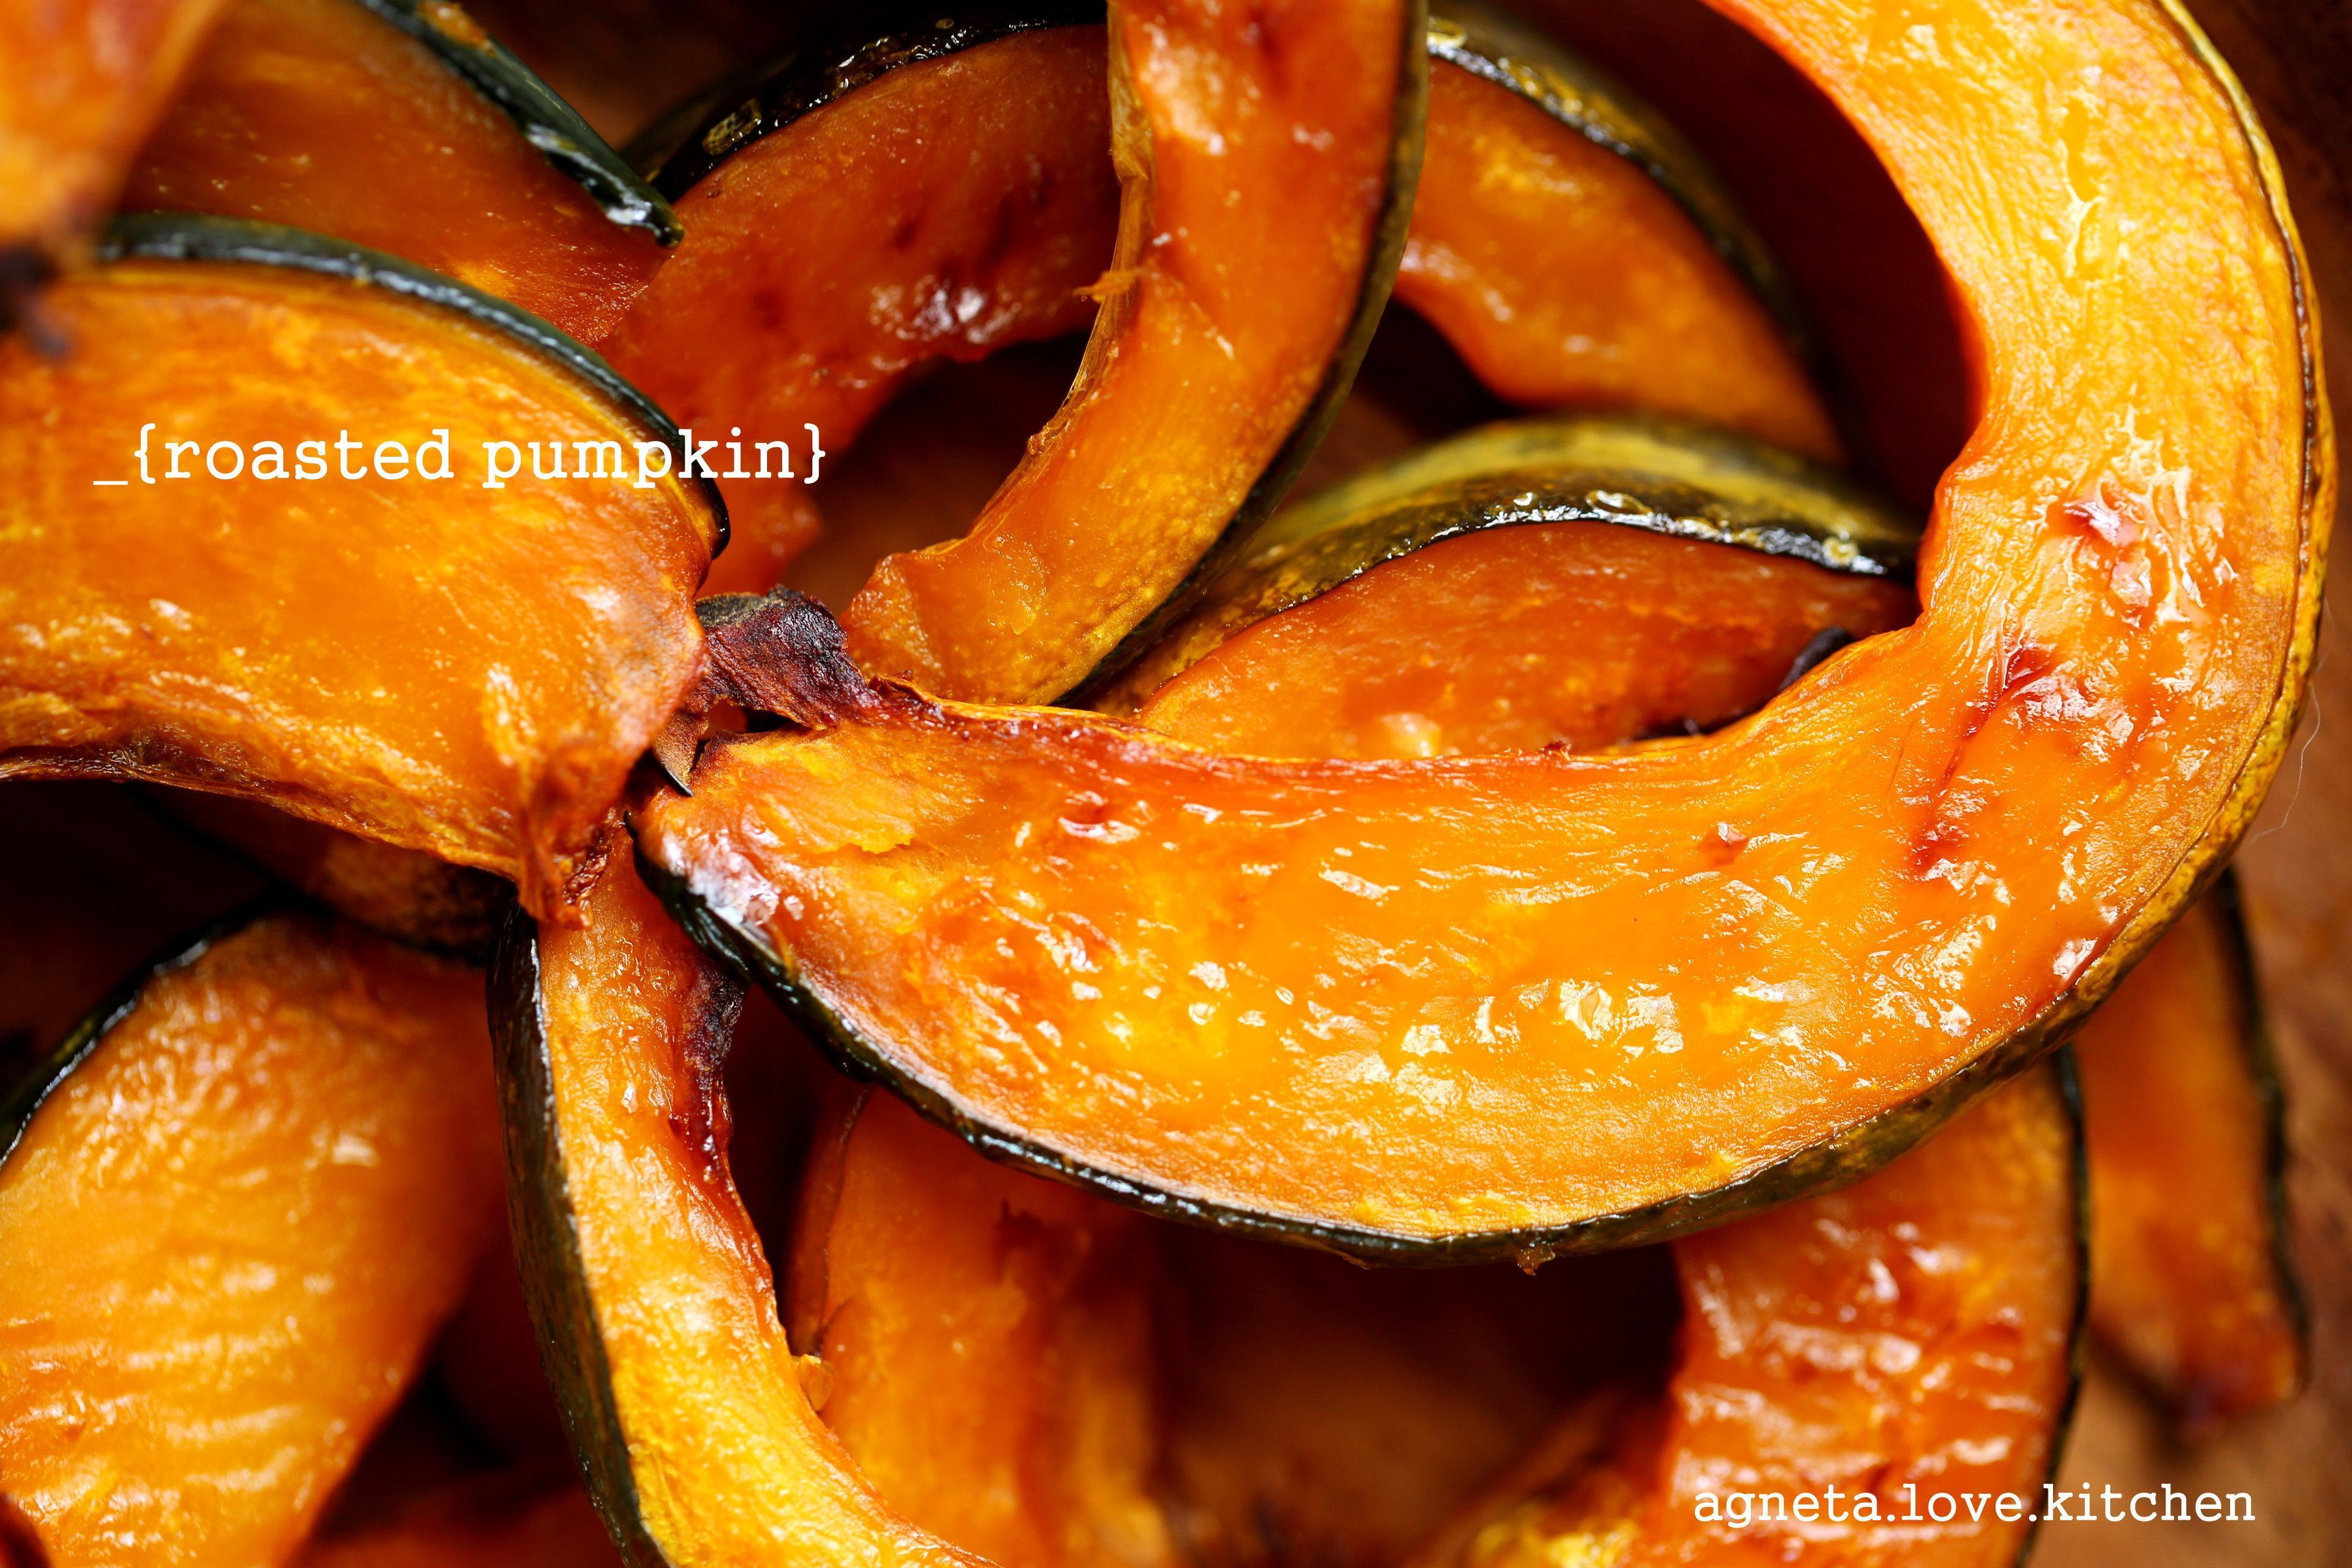 [sweet] 自然系零食,烤栗南瓜。